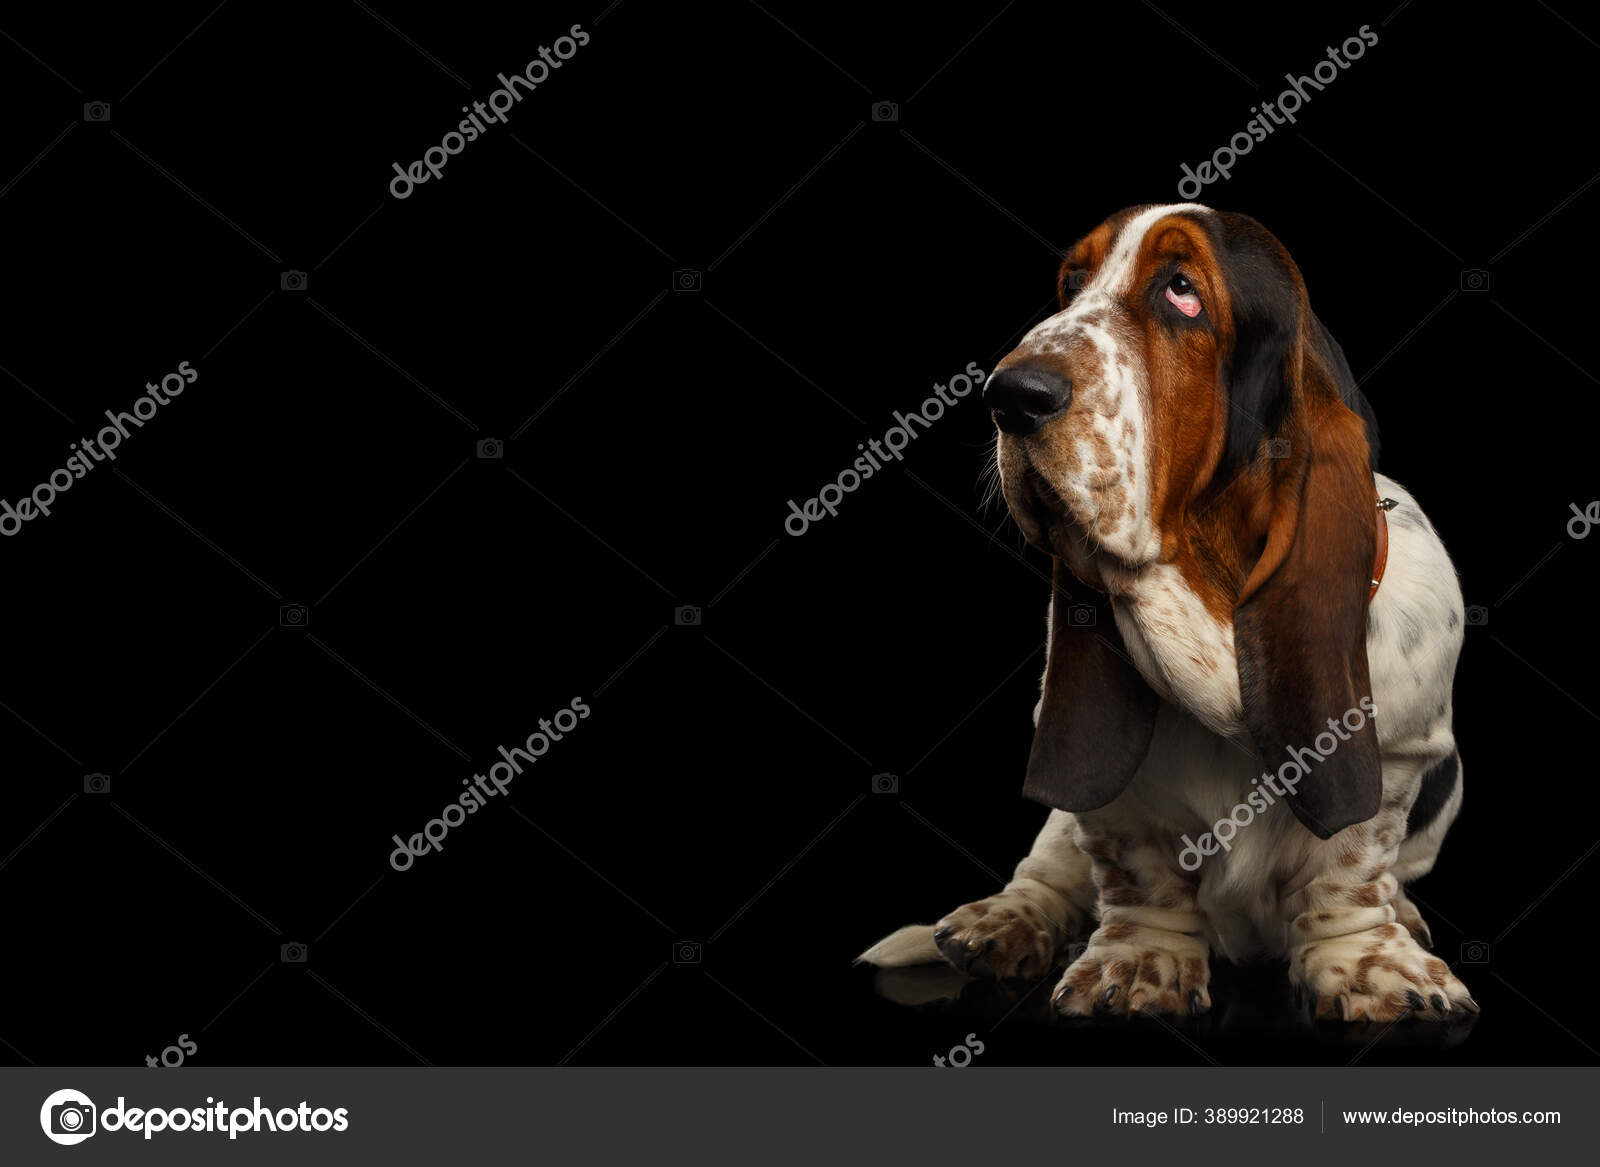 Funny Basset Hound Dog Standing Looks Apathy Isolated Black Background Stock Photo C Seregraf 389921288